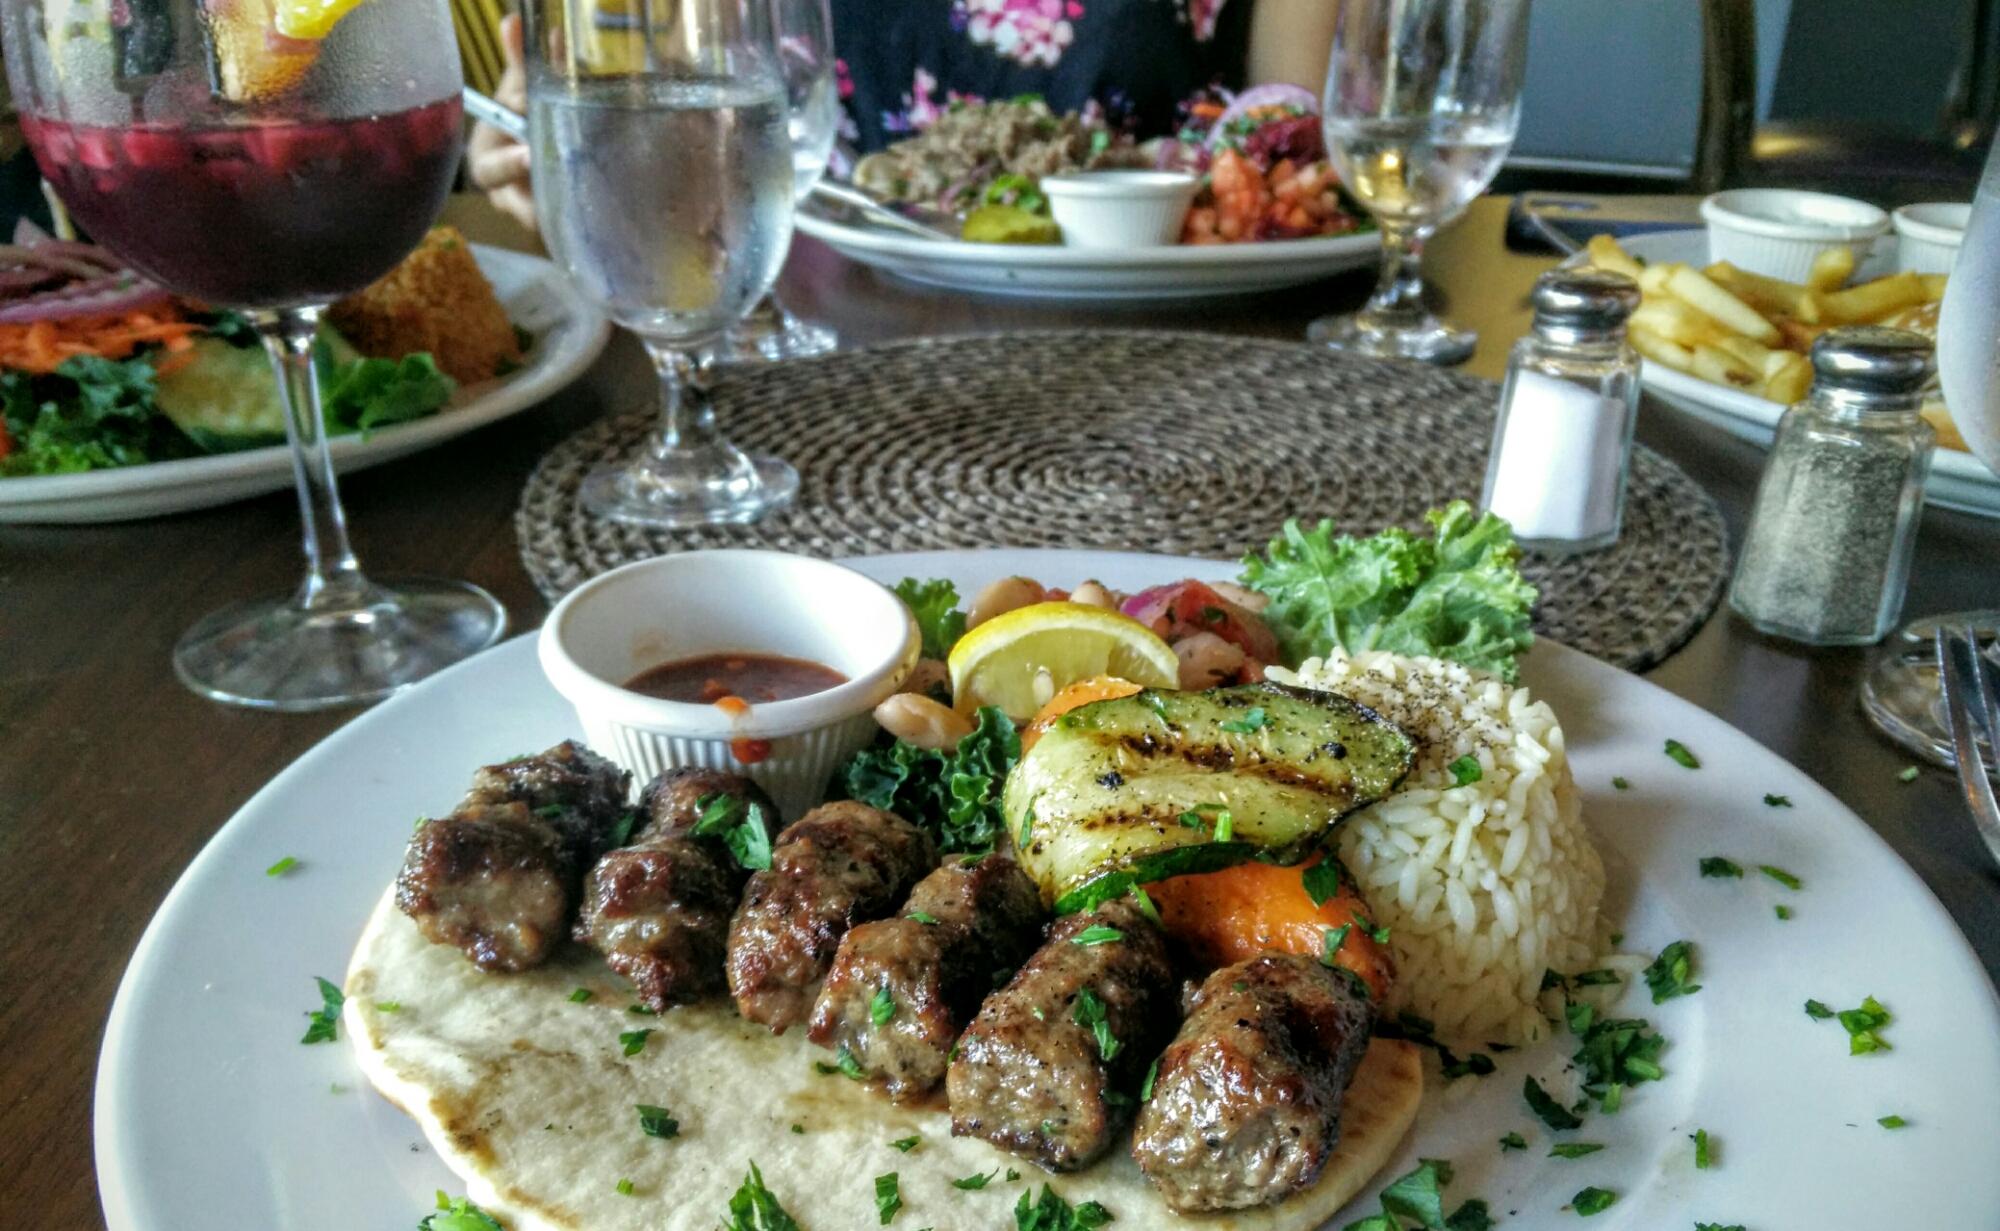 Delicious Spread At Agora Mediterranean Kitchen Ilovewpb Aguyonclematis